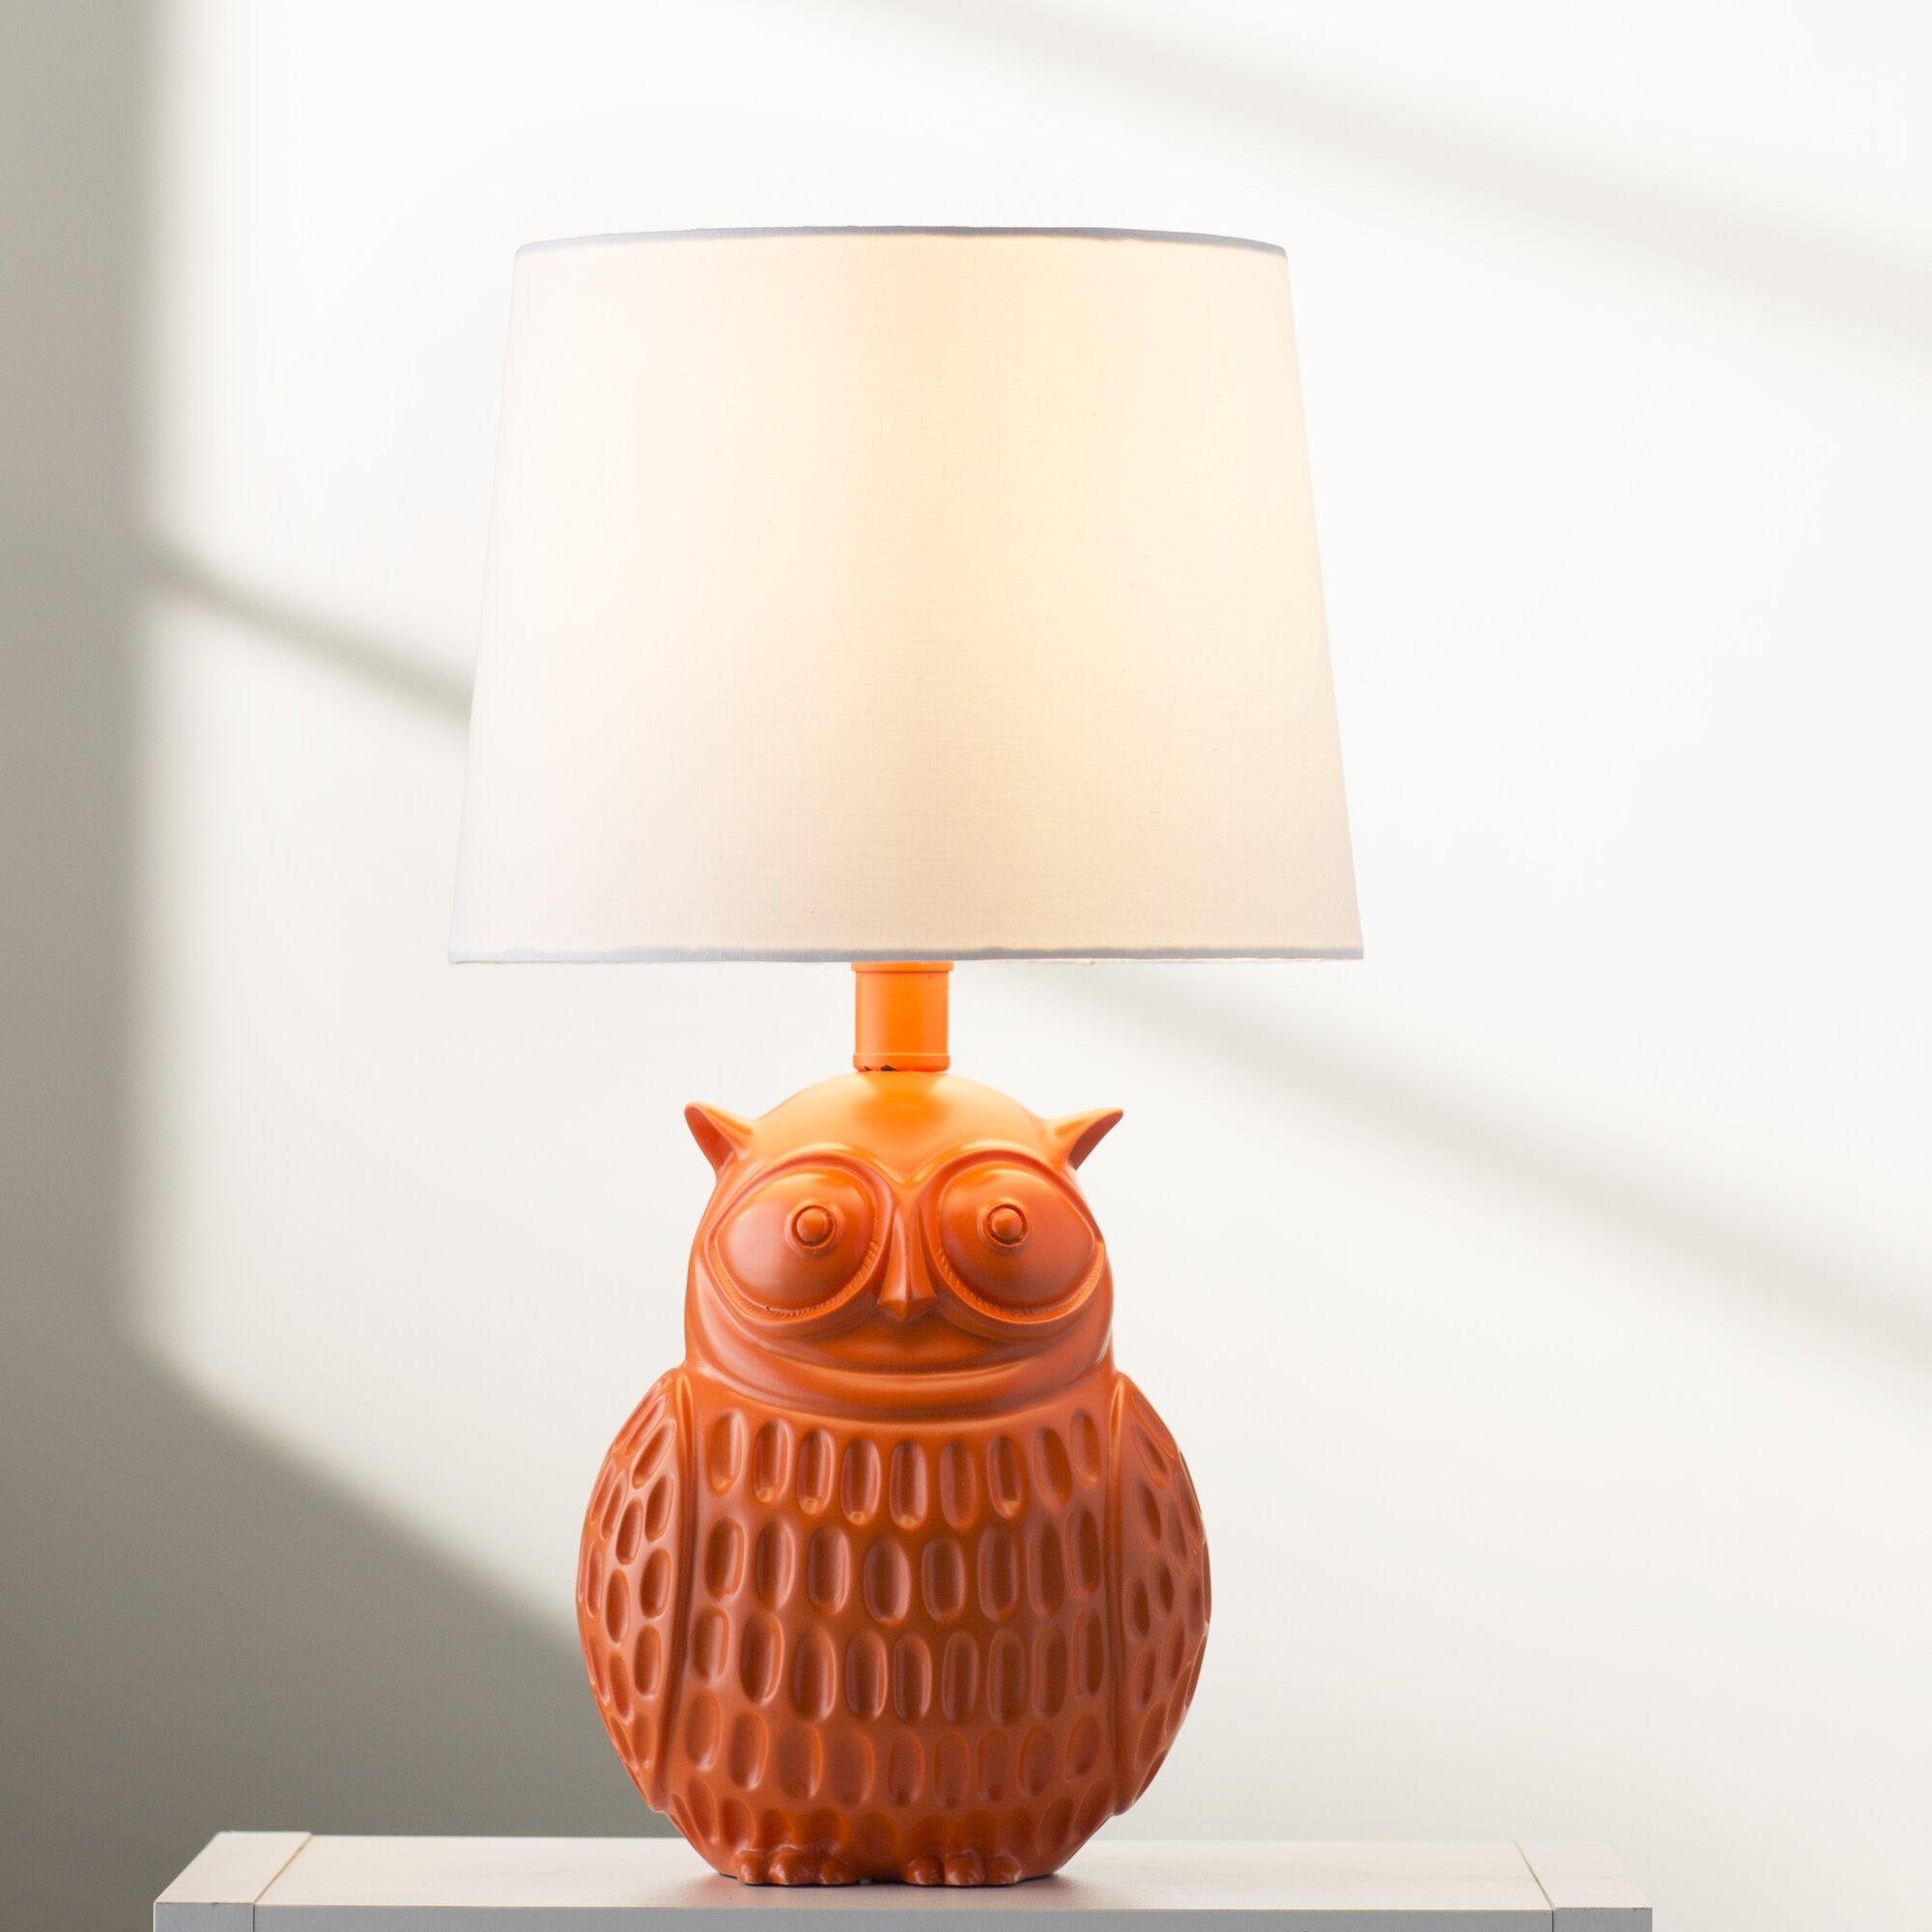 jonathan adler giraffe lamp  instalampus - jonathan adler giraffe lamp